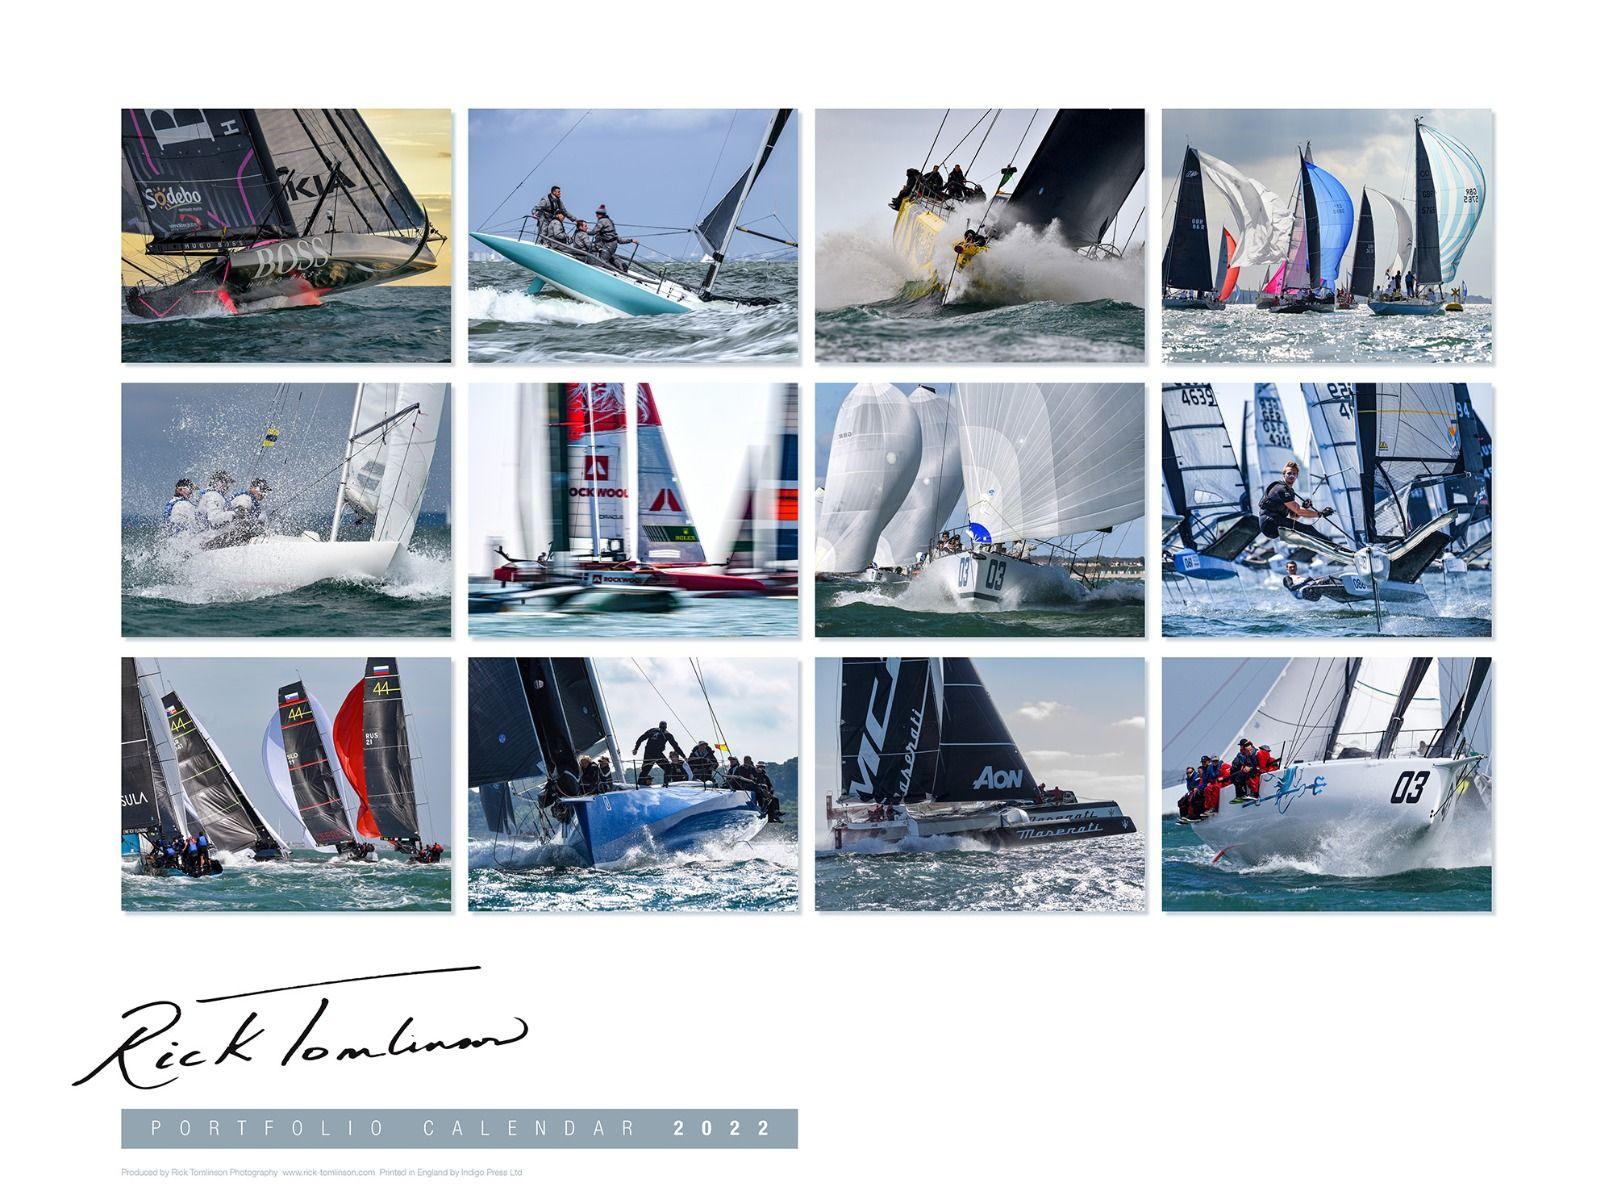 Rick Tomlinson Portfolio Kalender 2022